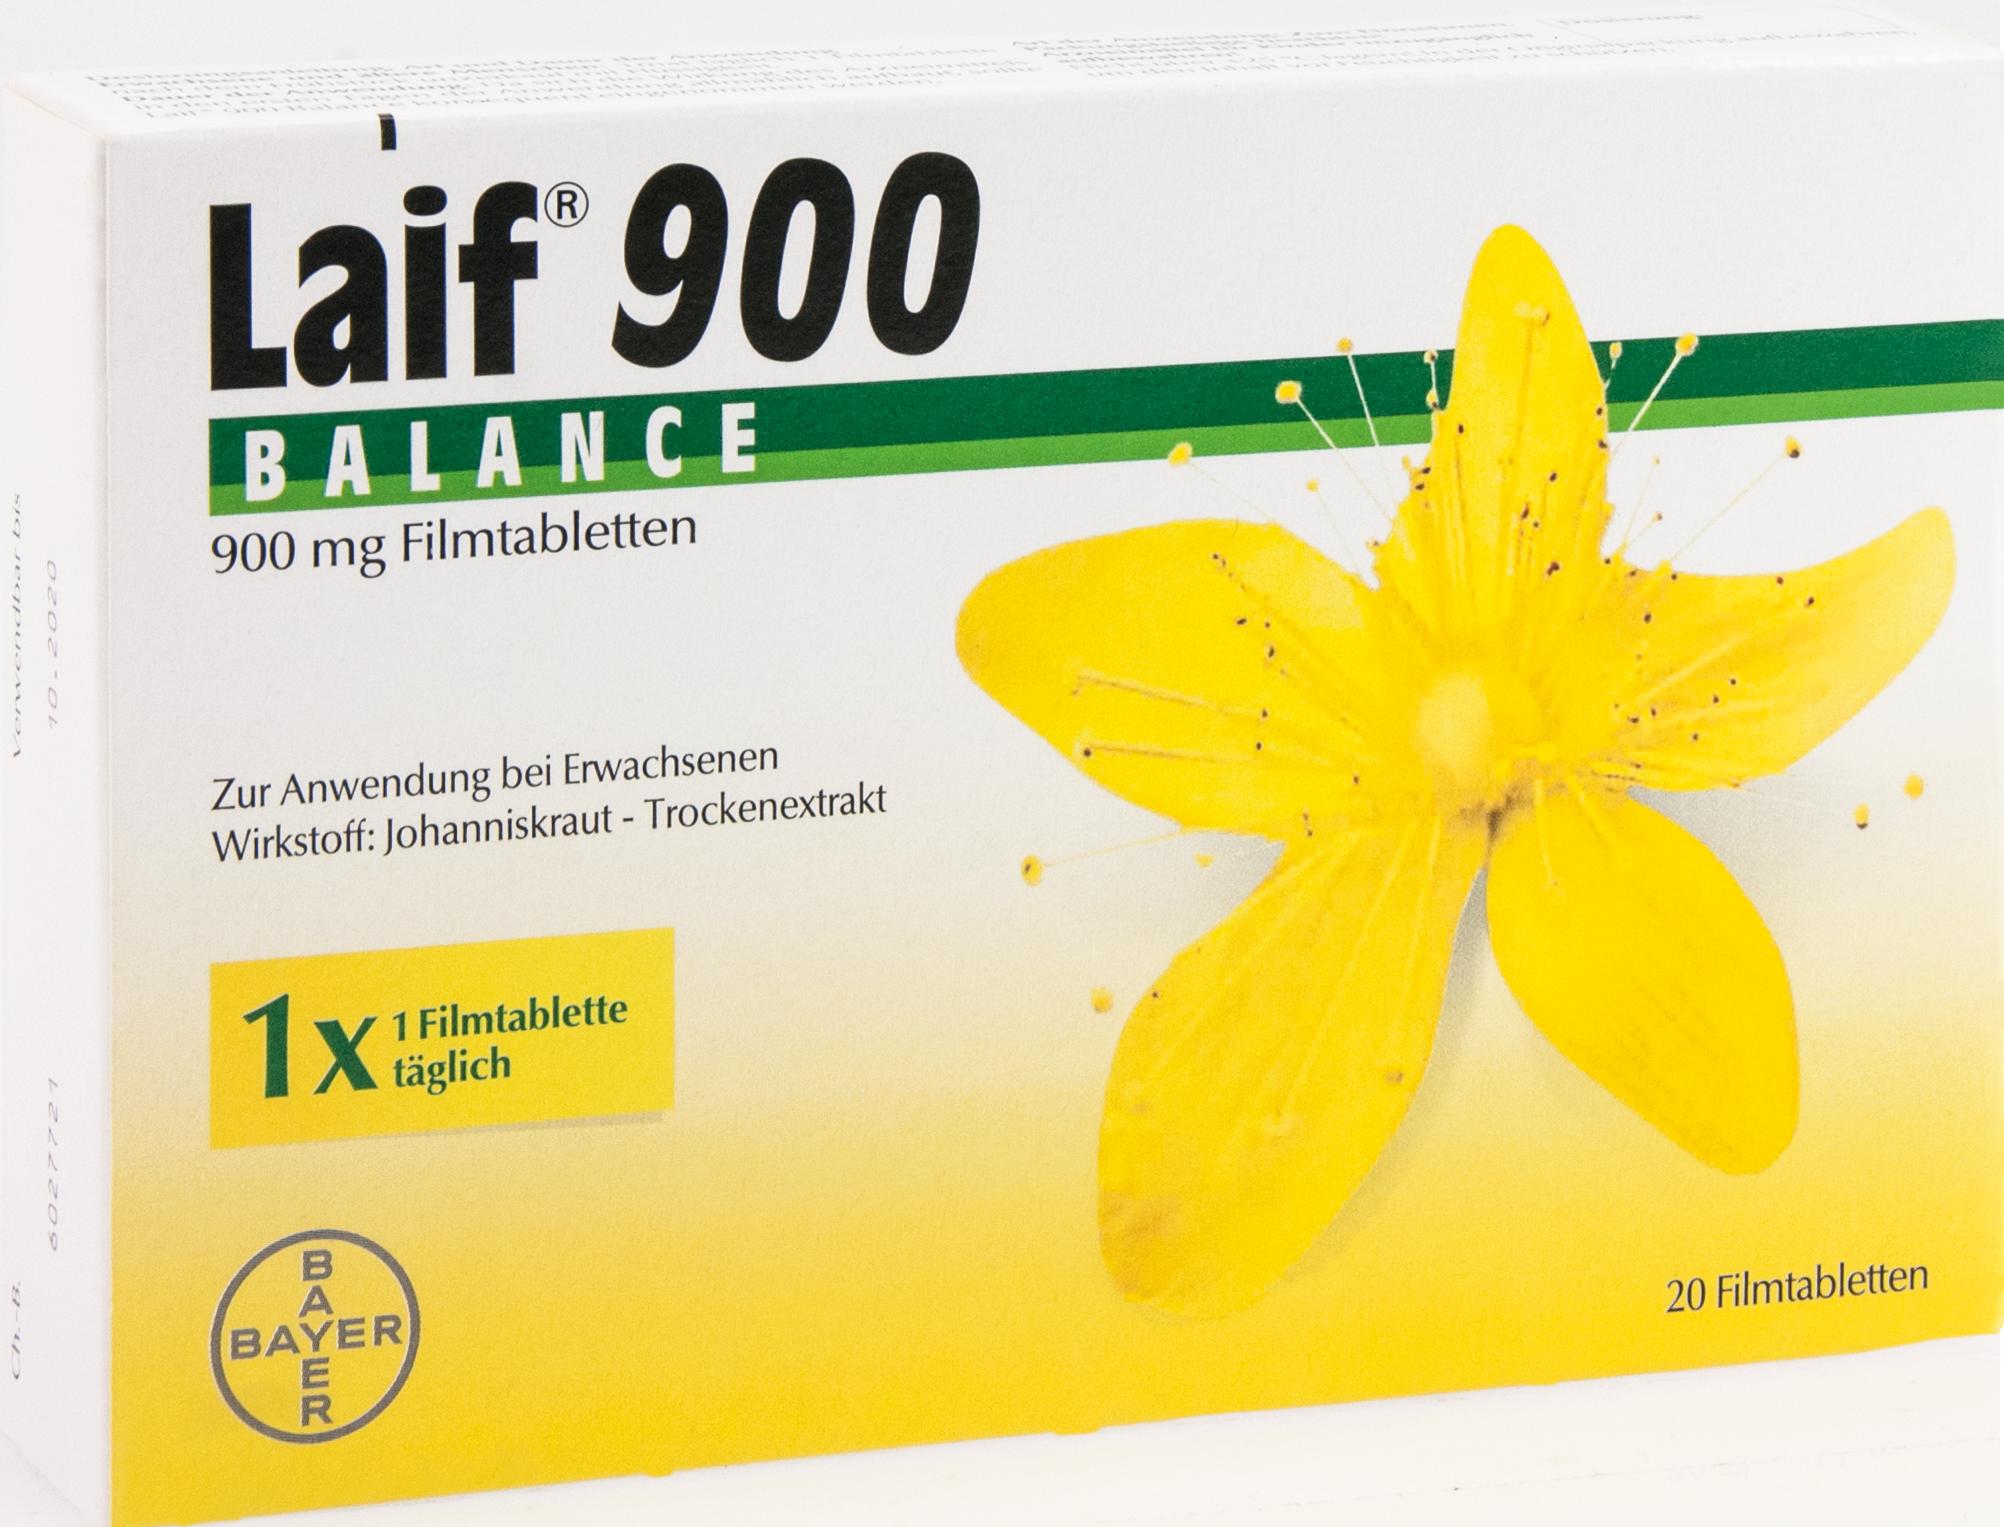 Laif 900 BALANCE